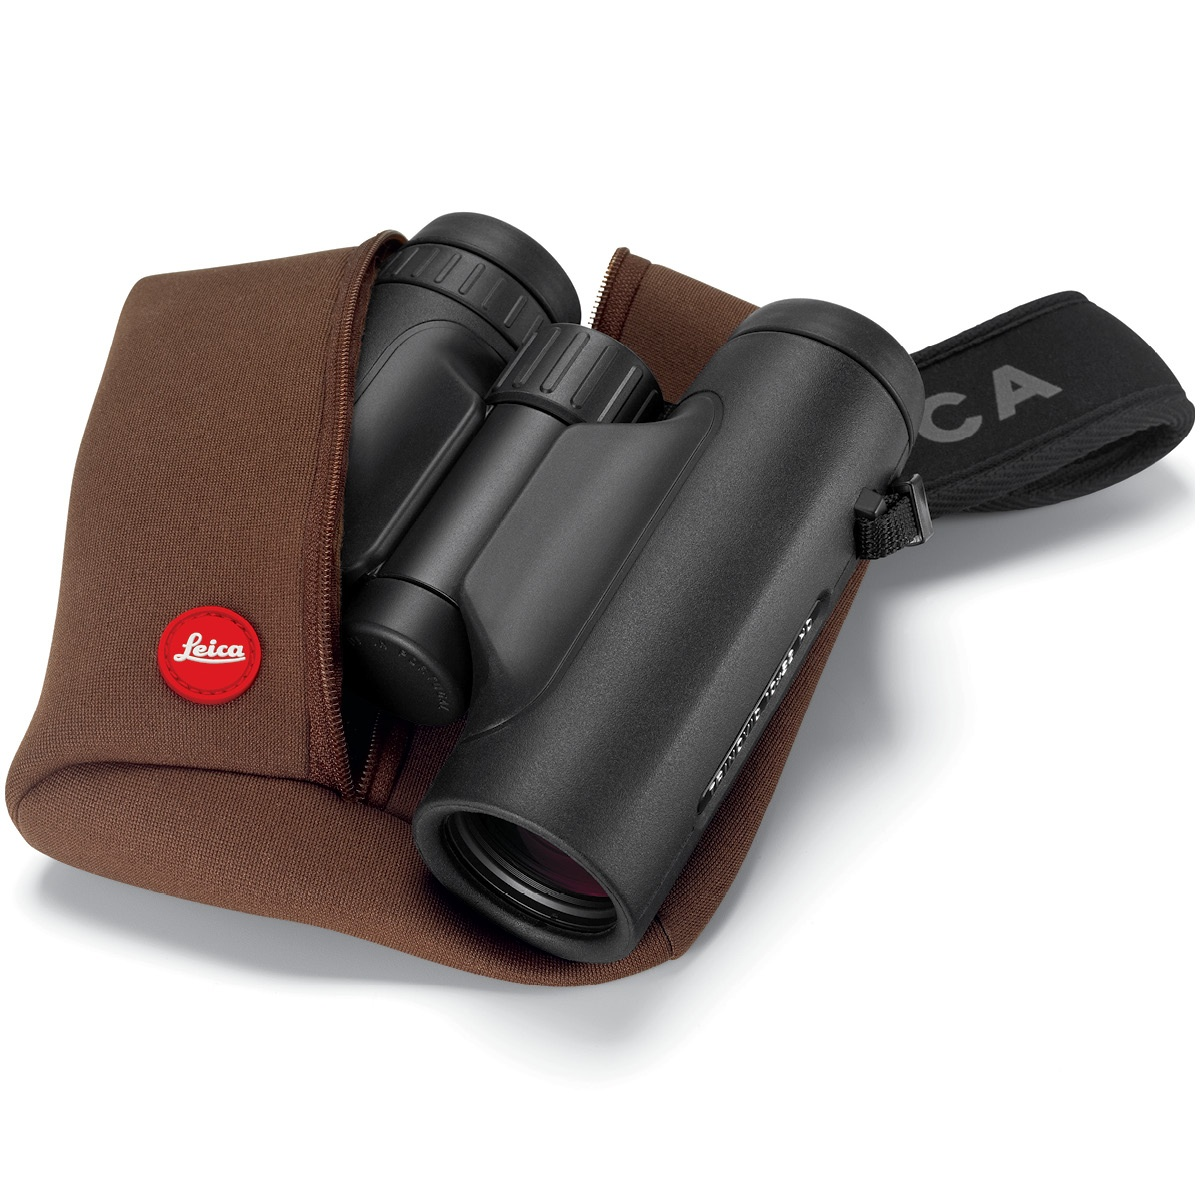 Leica Trinovid 8x32 HD